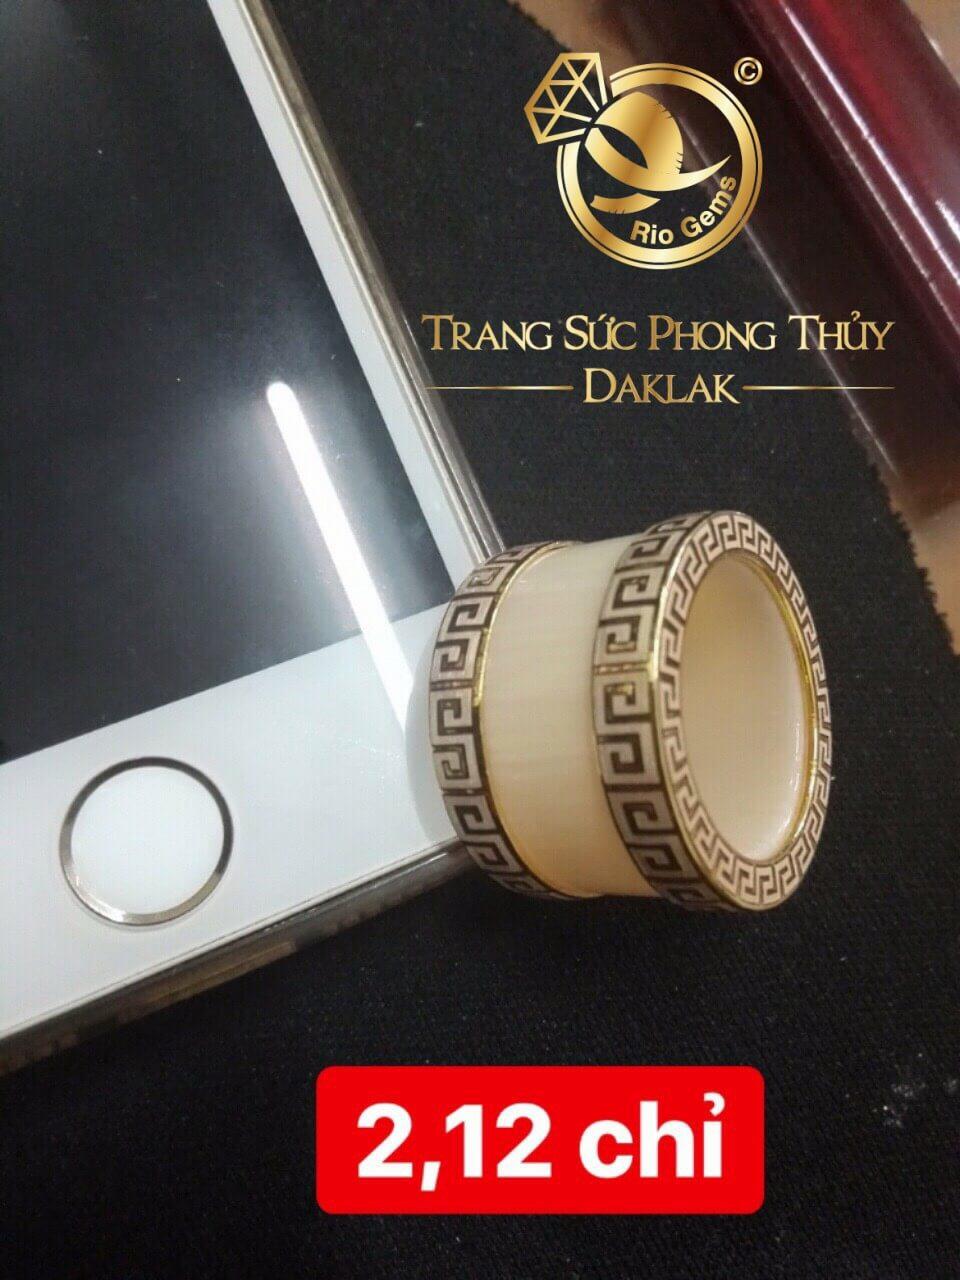 nhan-can-long-4-vien-hoa-van-bang-22li-riogems